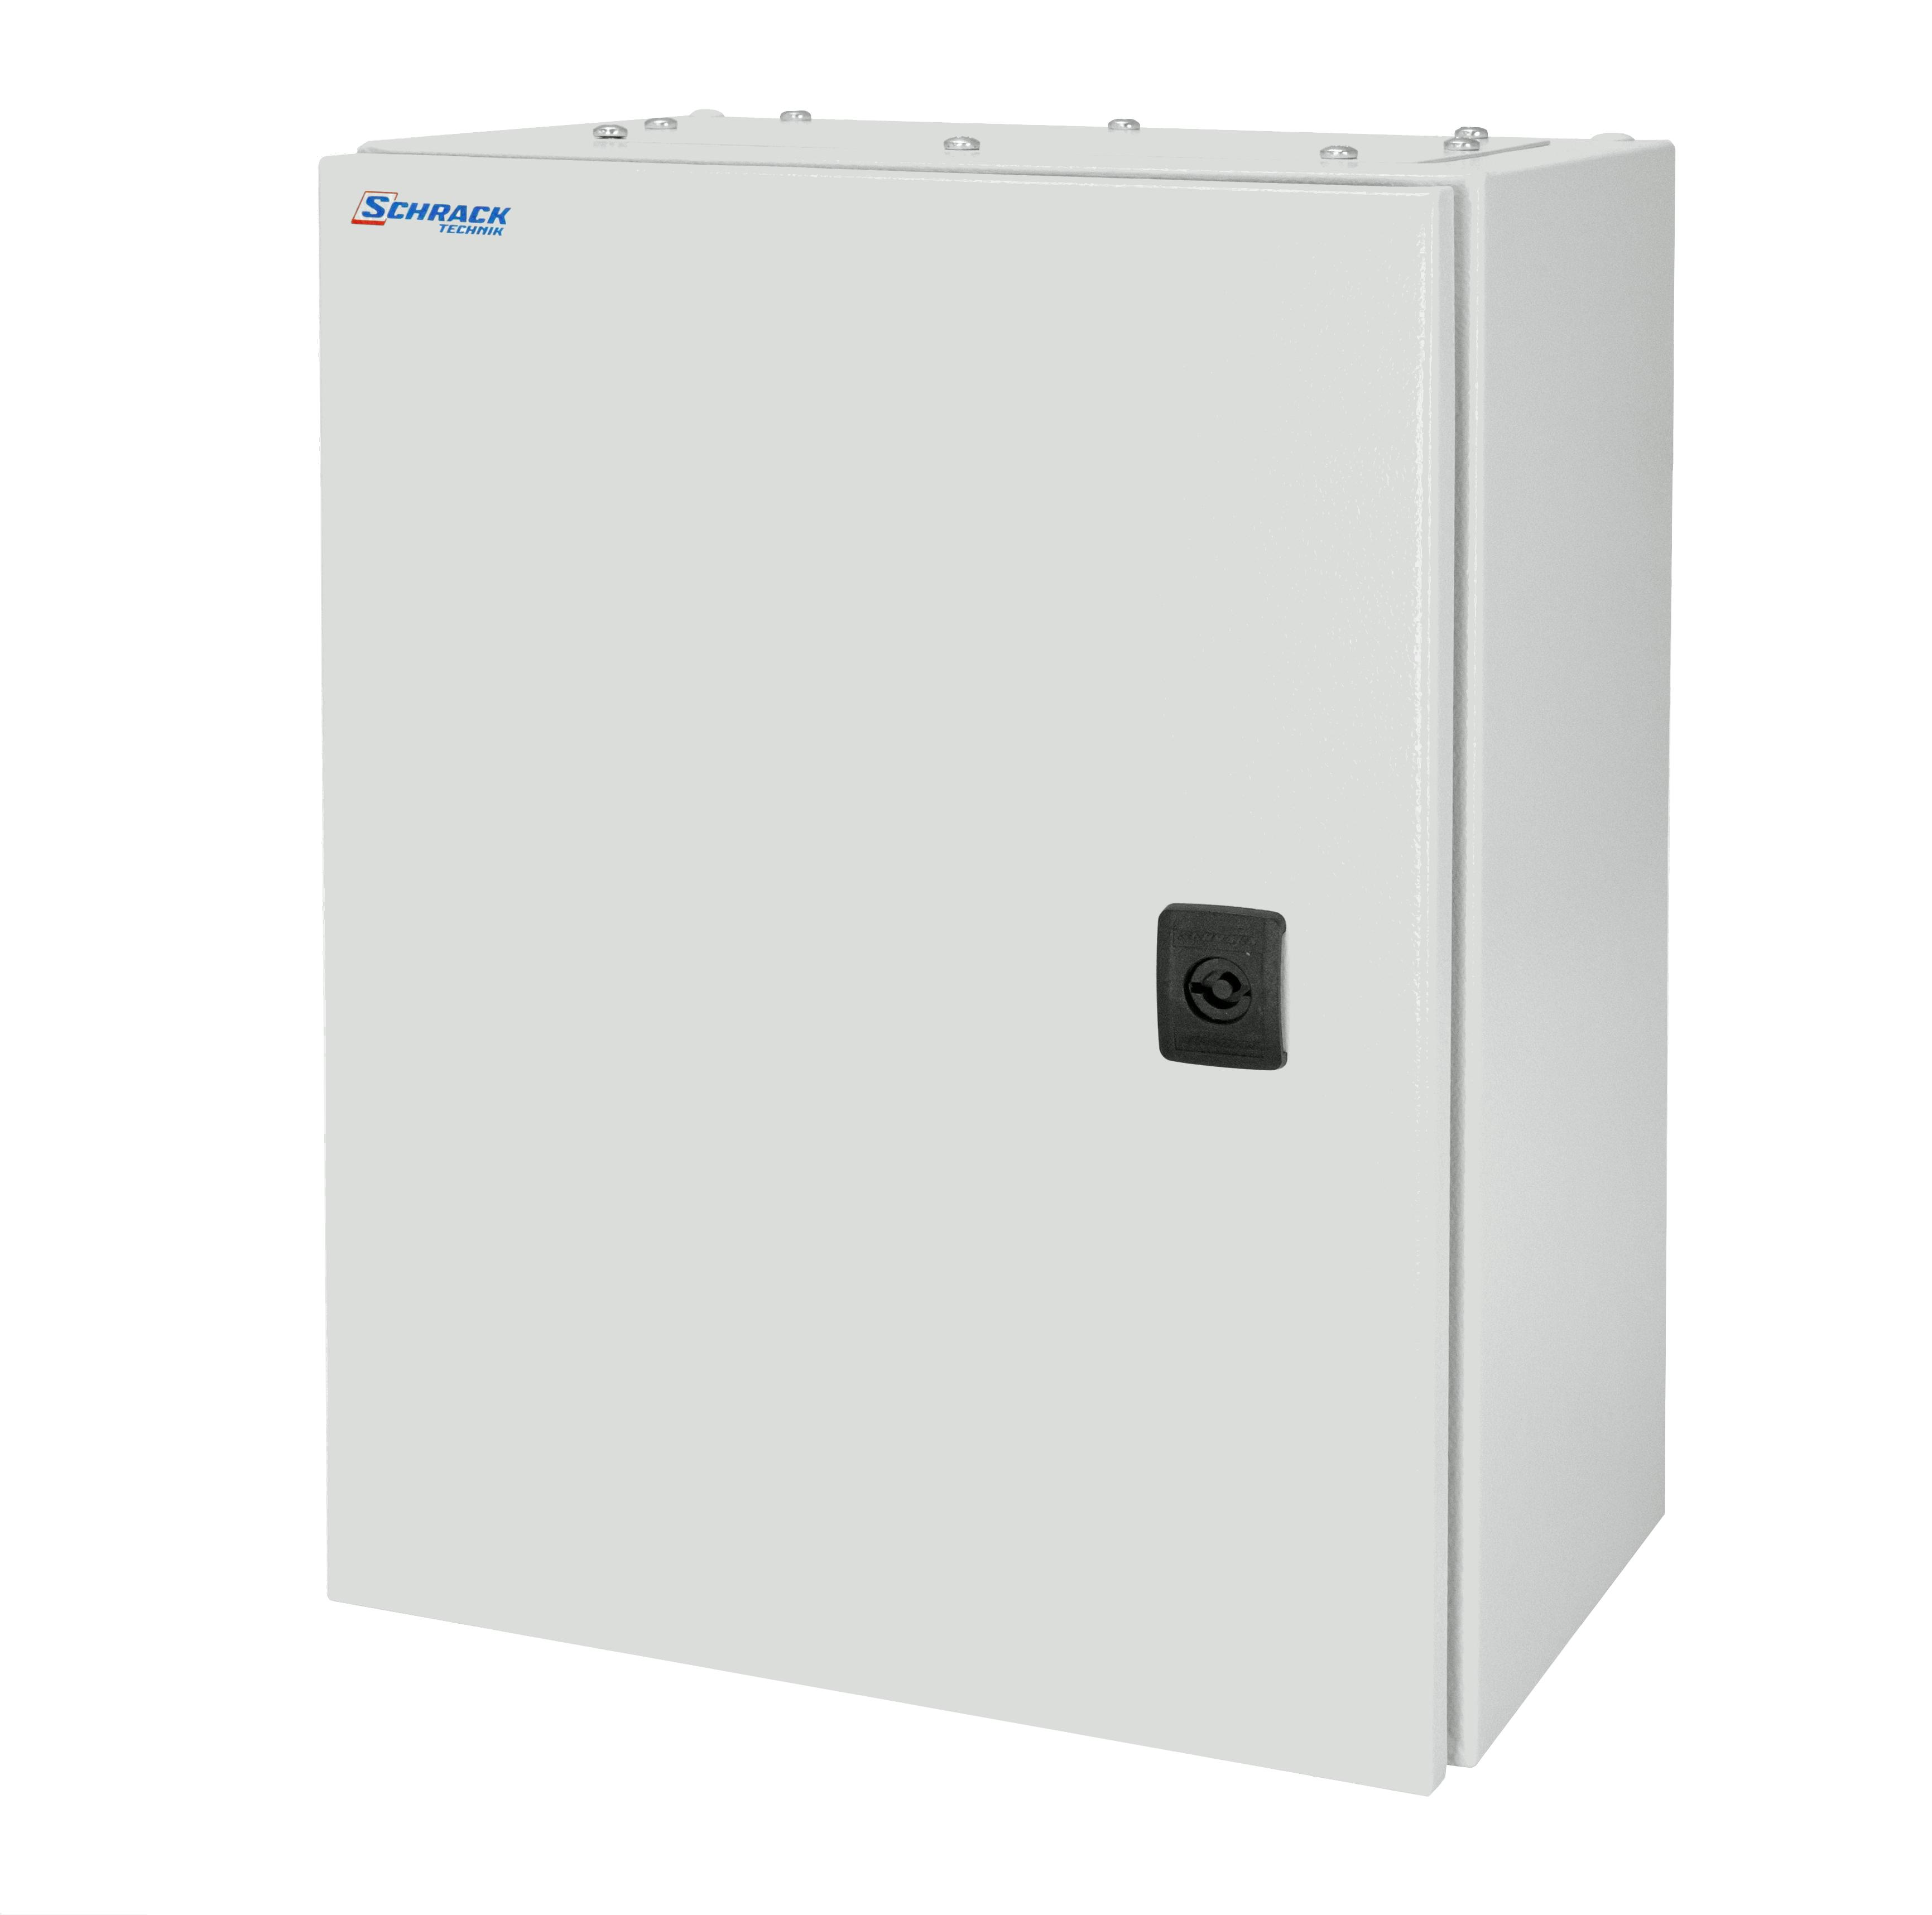 1 Stk Wandschrank Mono IP66 H=1000 B=800 T=400 Stahlblech WSM1008400